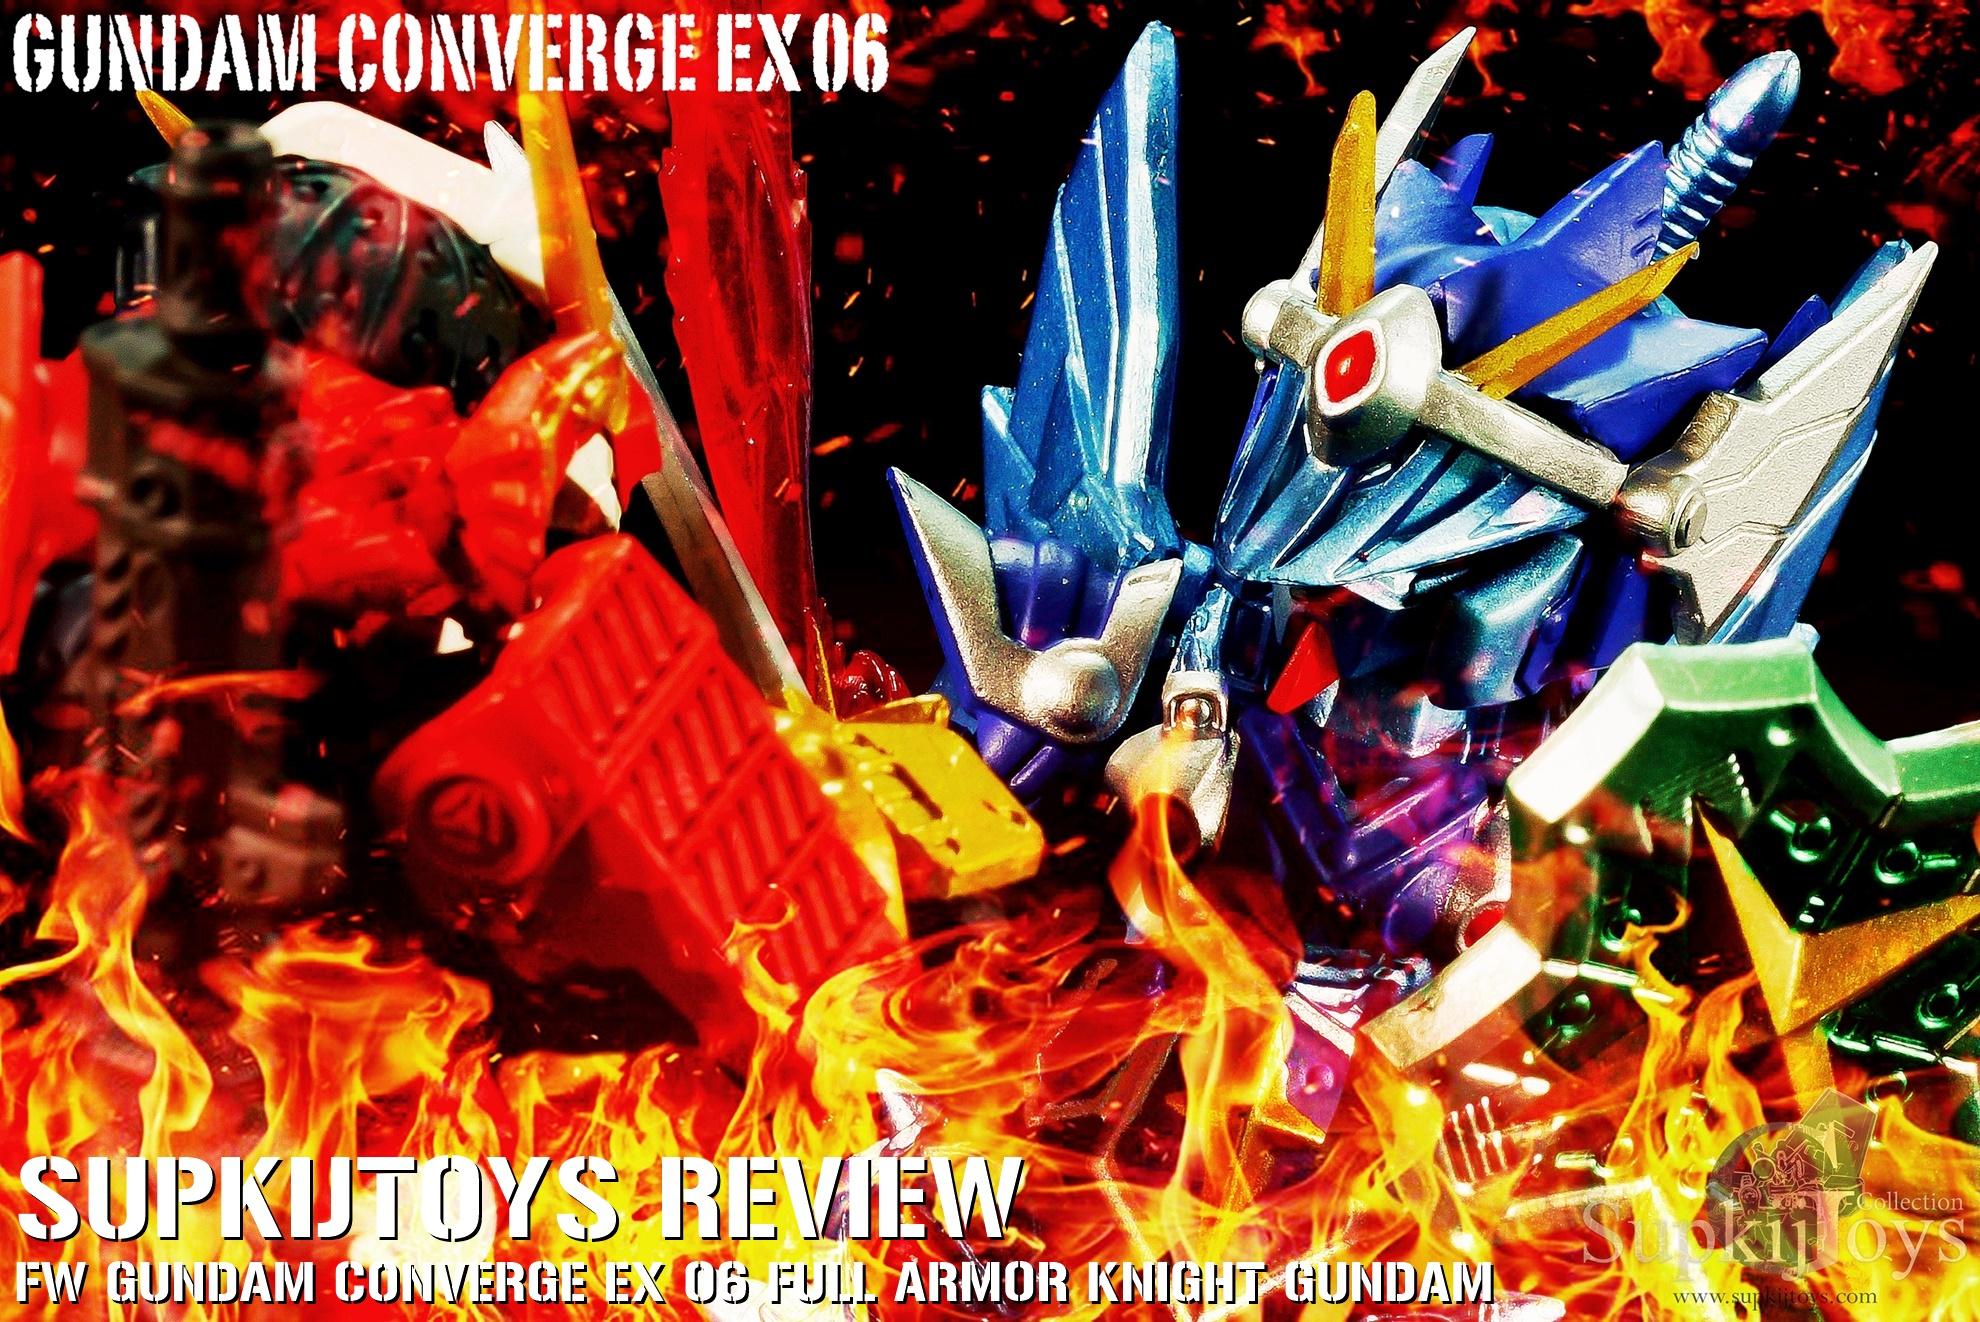 SupkijToys FW Gundam Converge EX 06 Full Armor Knight Gundam & EX 05 Musha Gundam - Review